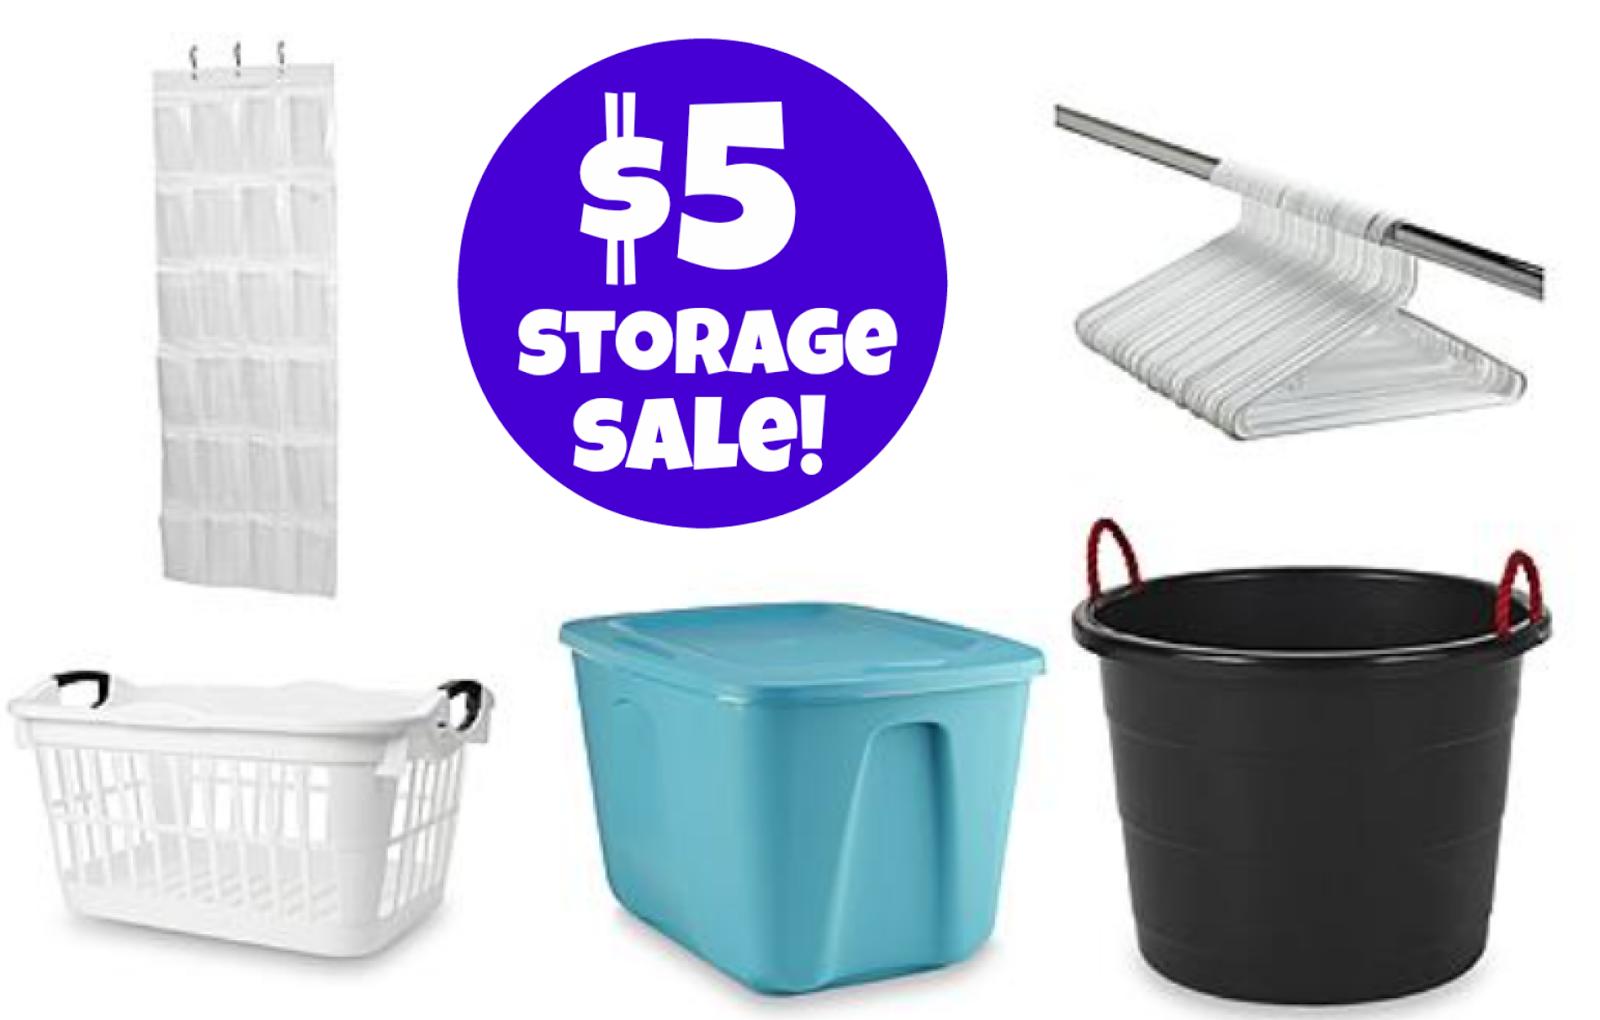 http://www.thebinderladies.com/2015/01/kmart-com-5-storage-sale-18-gallon.html#.VKw7MofduyM